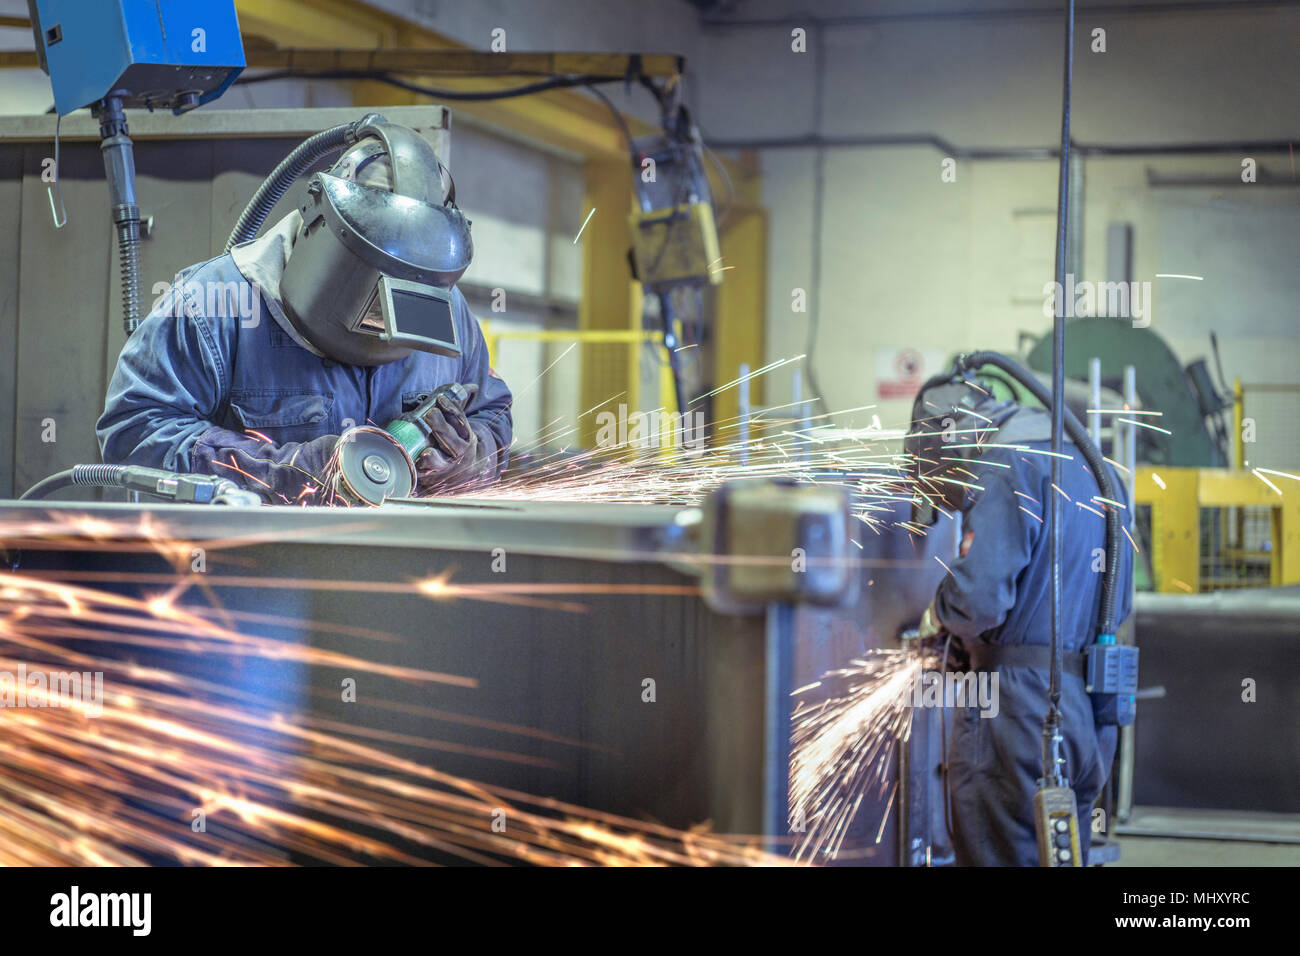 Workers using grinders in engineering factory - Stock Image